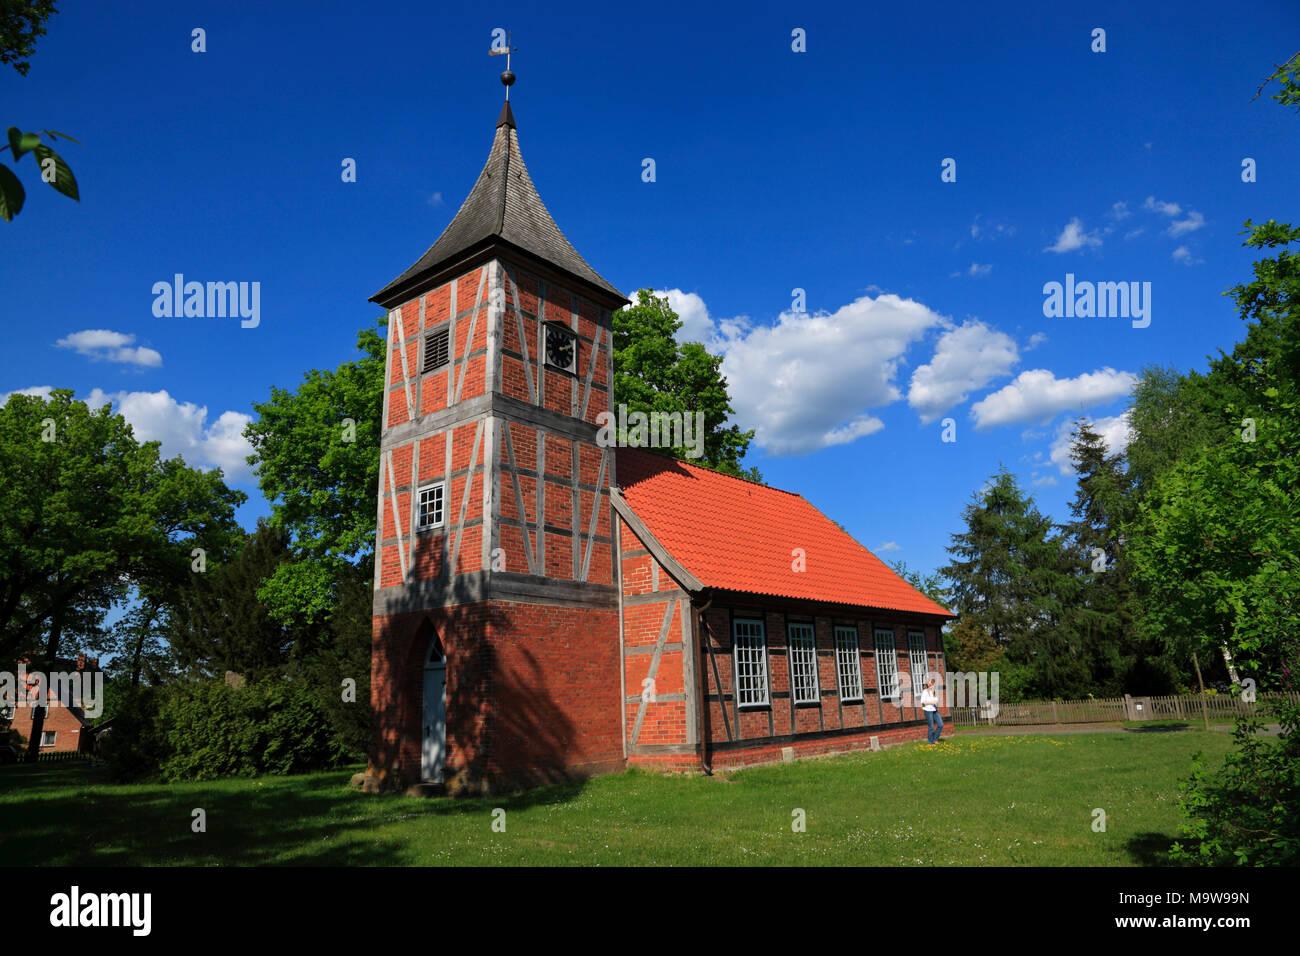 St. Nikolai Kapelle in Haar, Amt Neuhaus, Niedersachsen, Deutschland, Europa Stockbild